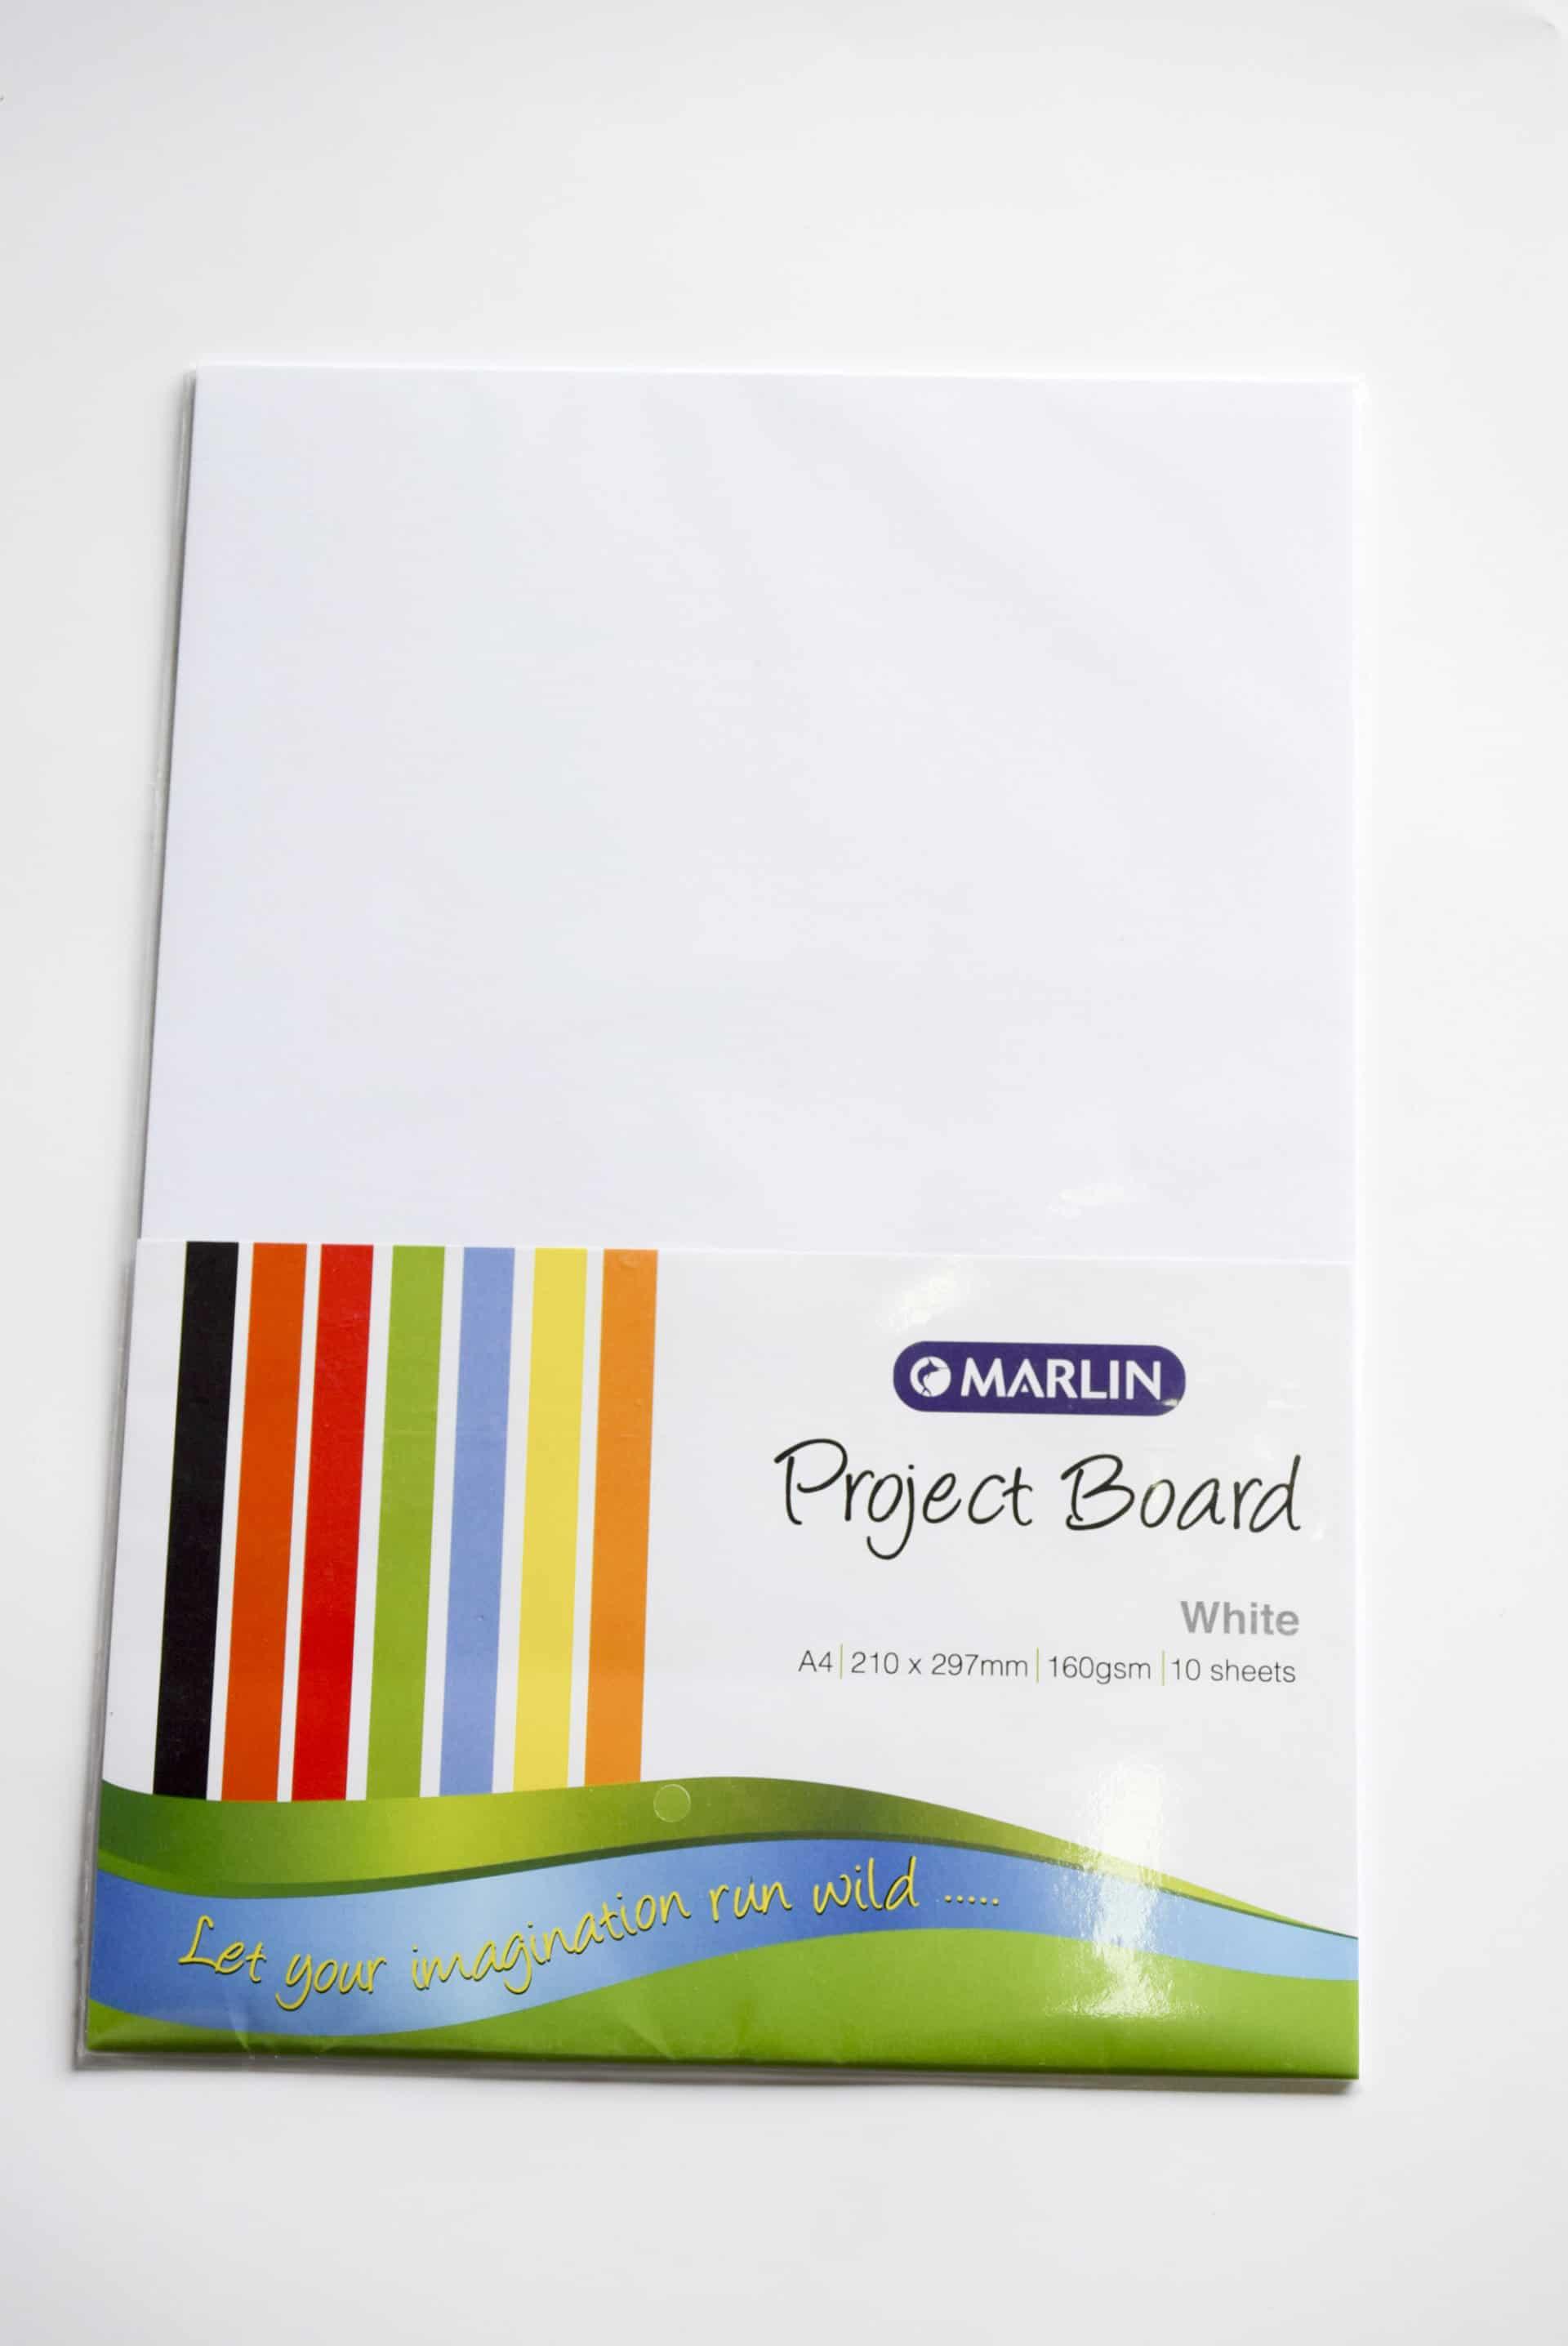 A4 Project Board White 10 Sheet Marlin 1